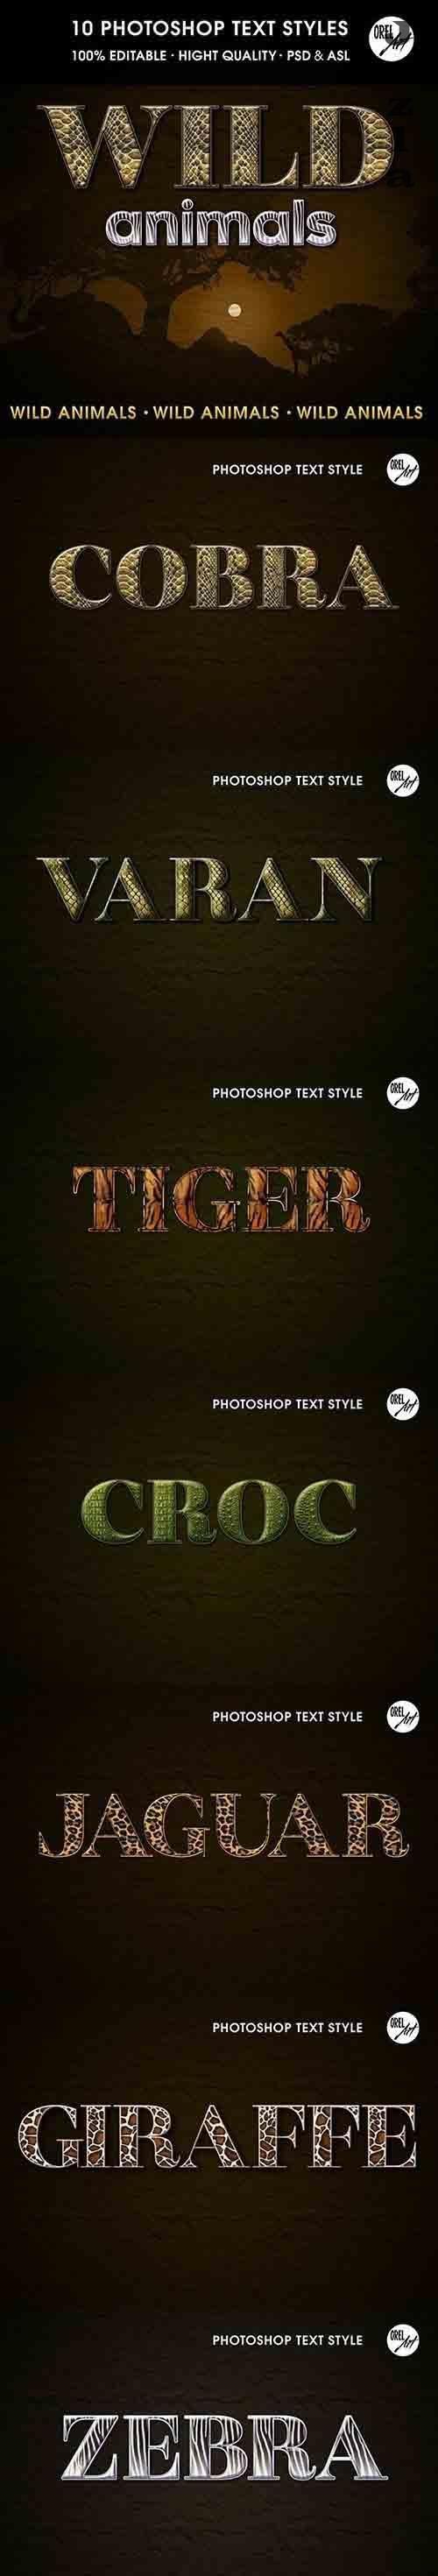 GraphicRiver - Wild Animals Text Styles 30385880